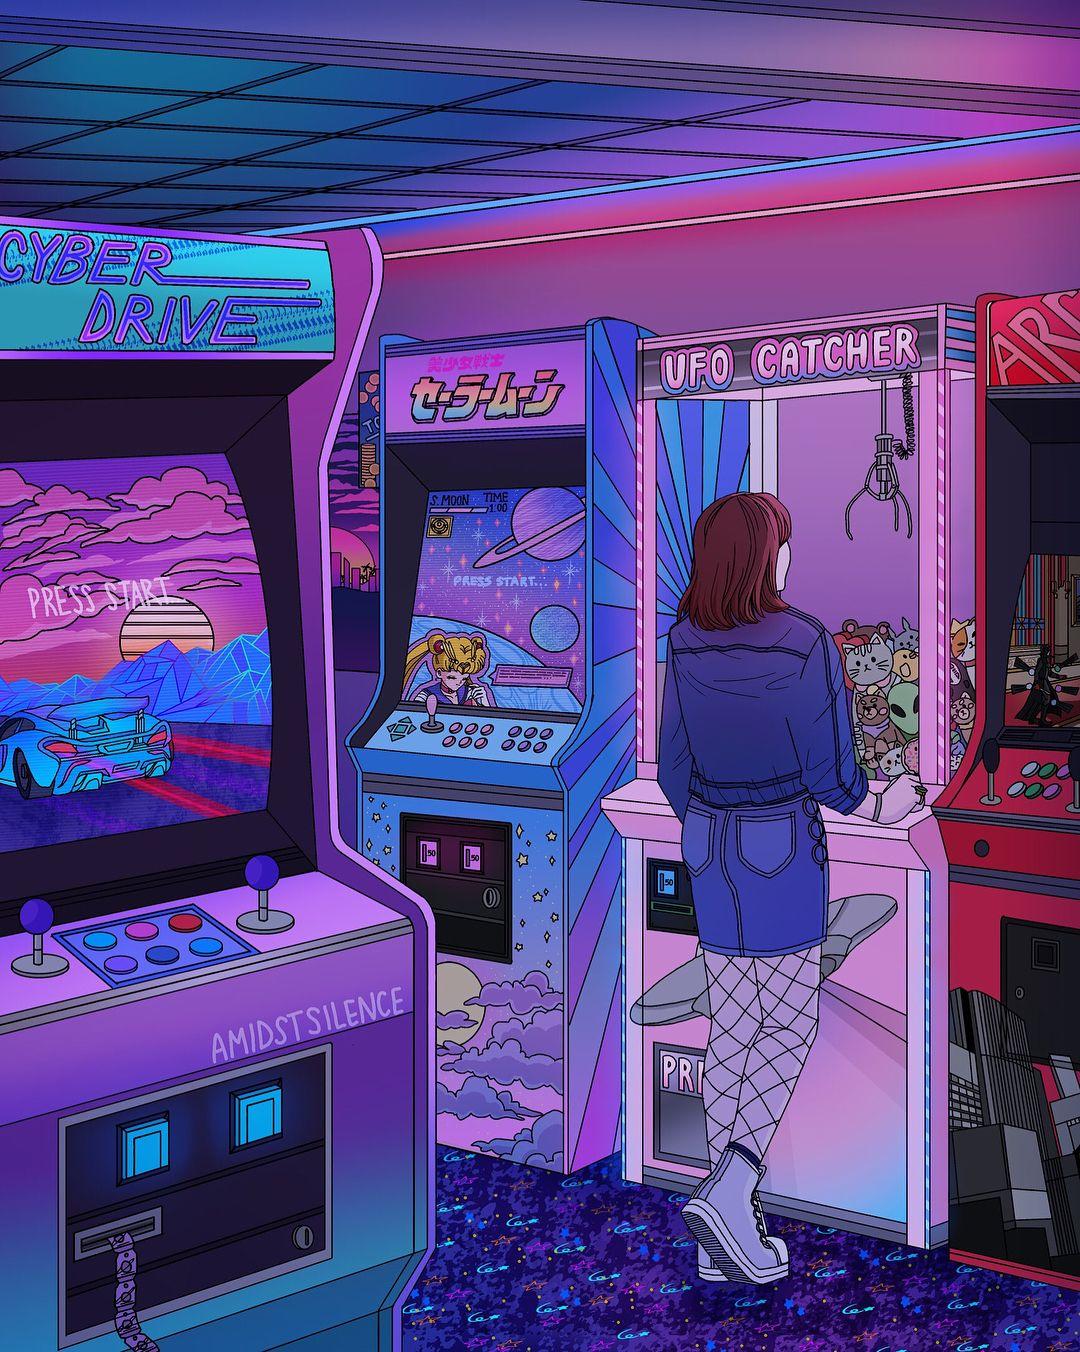 Kelsey Smith Amidst Silence On Instagram Arcade This One Took Me Longer Than I Anticipated Because Of The Retro Kartinki Vintazhnye Plakaty Fioletovye Fony